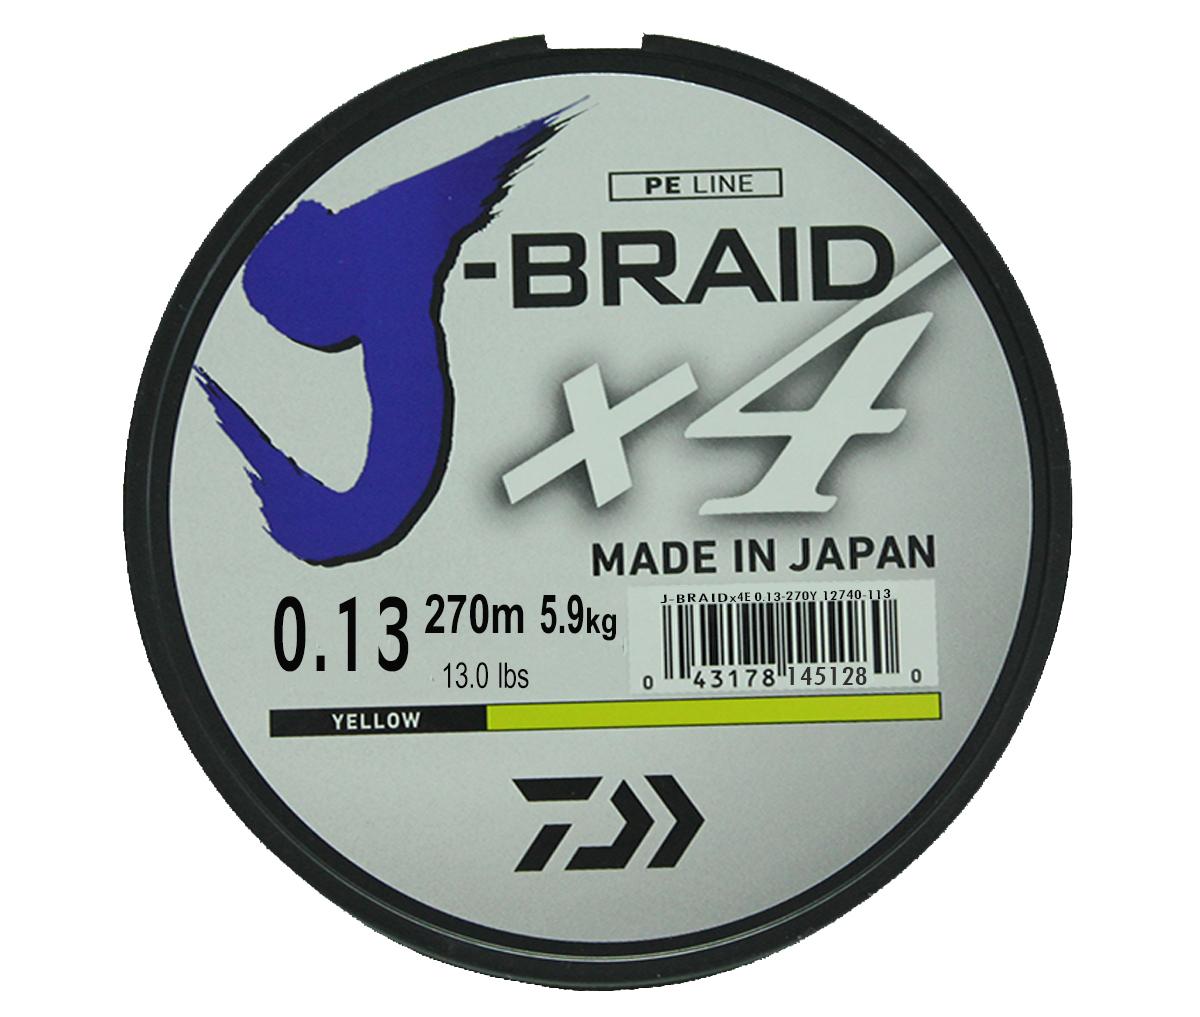 Шнур плетеный Daiwa J-Braid X4, цвет: флуоресцентный желтый, 270 м, 0,13 мм